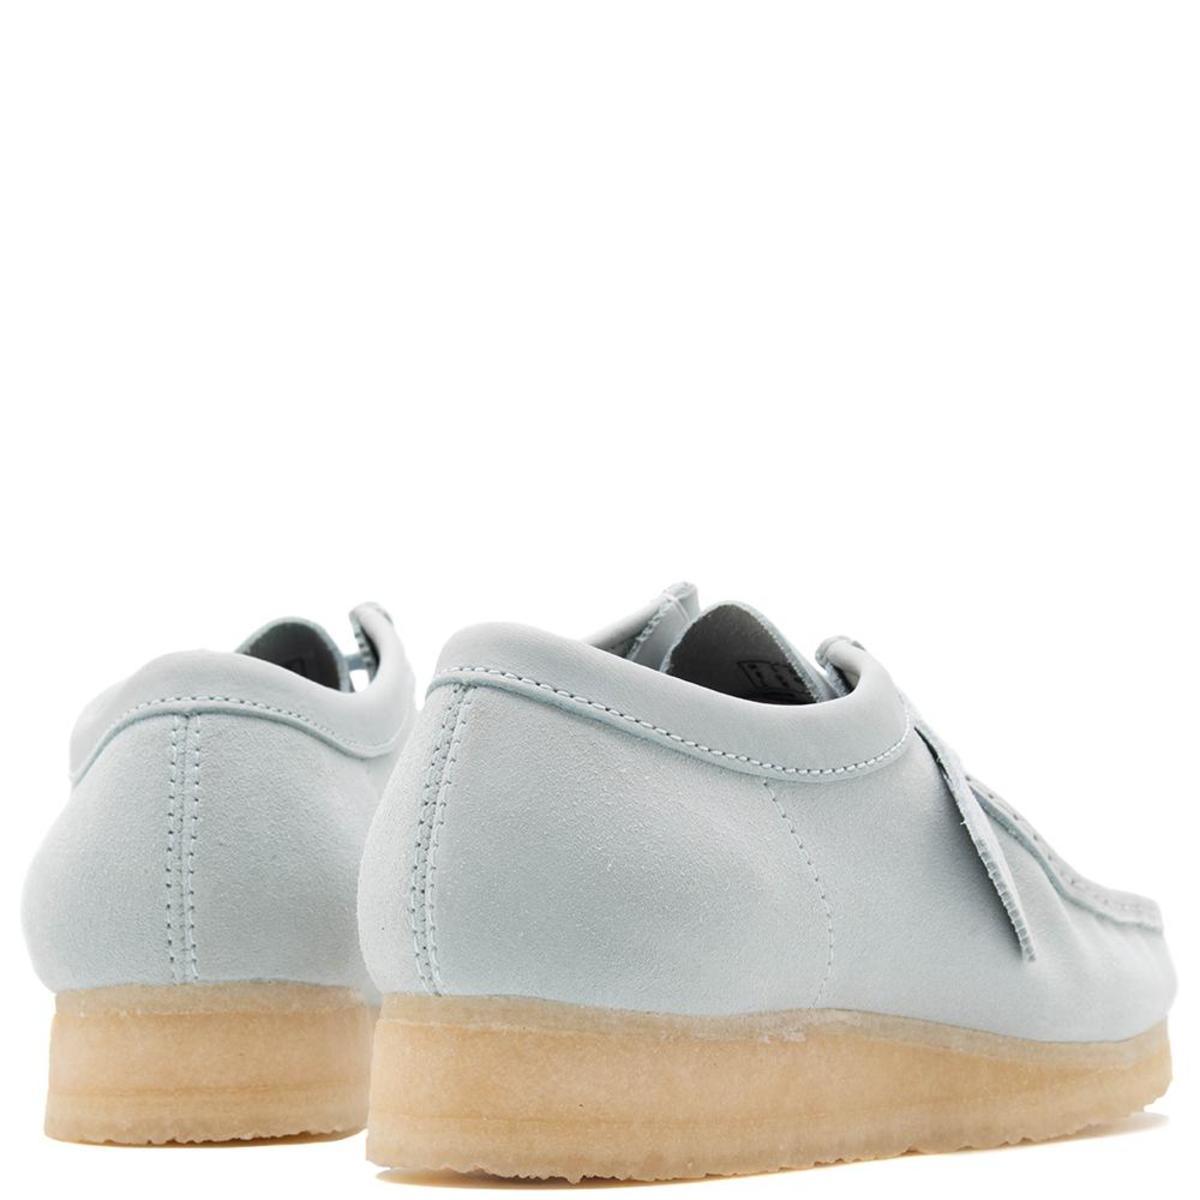 Light Blue Combi Clarks Originals Wallabee Suede Shoes